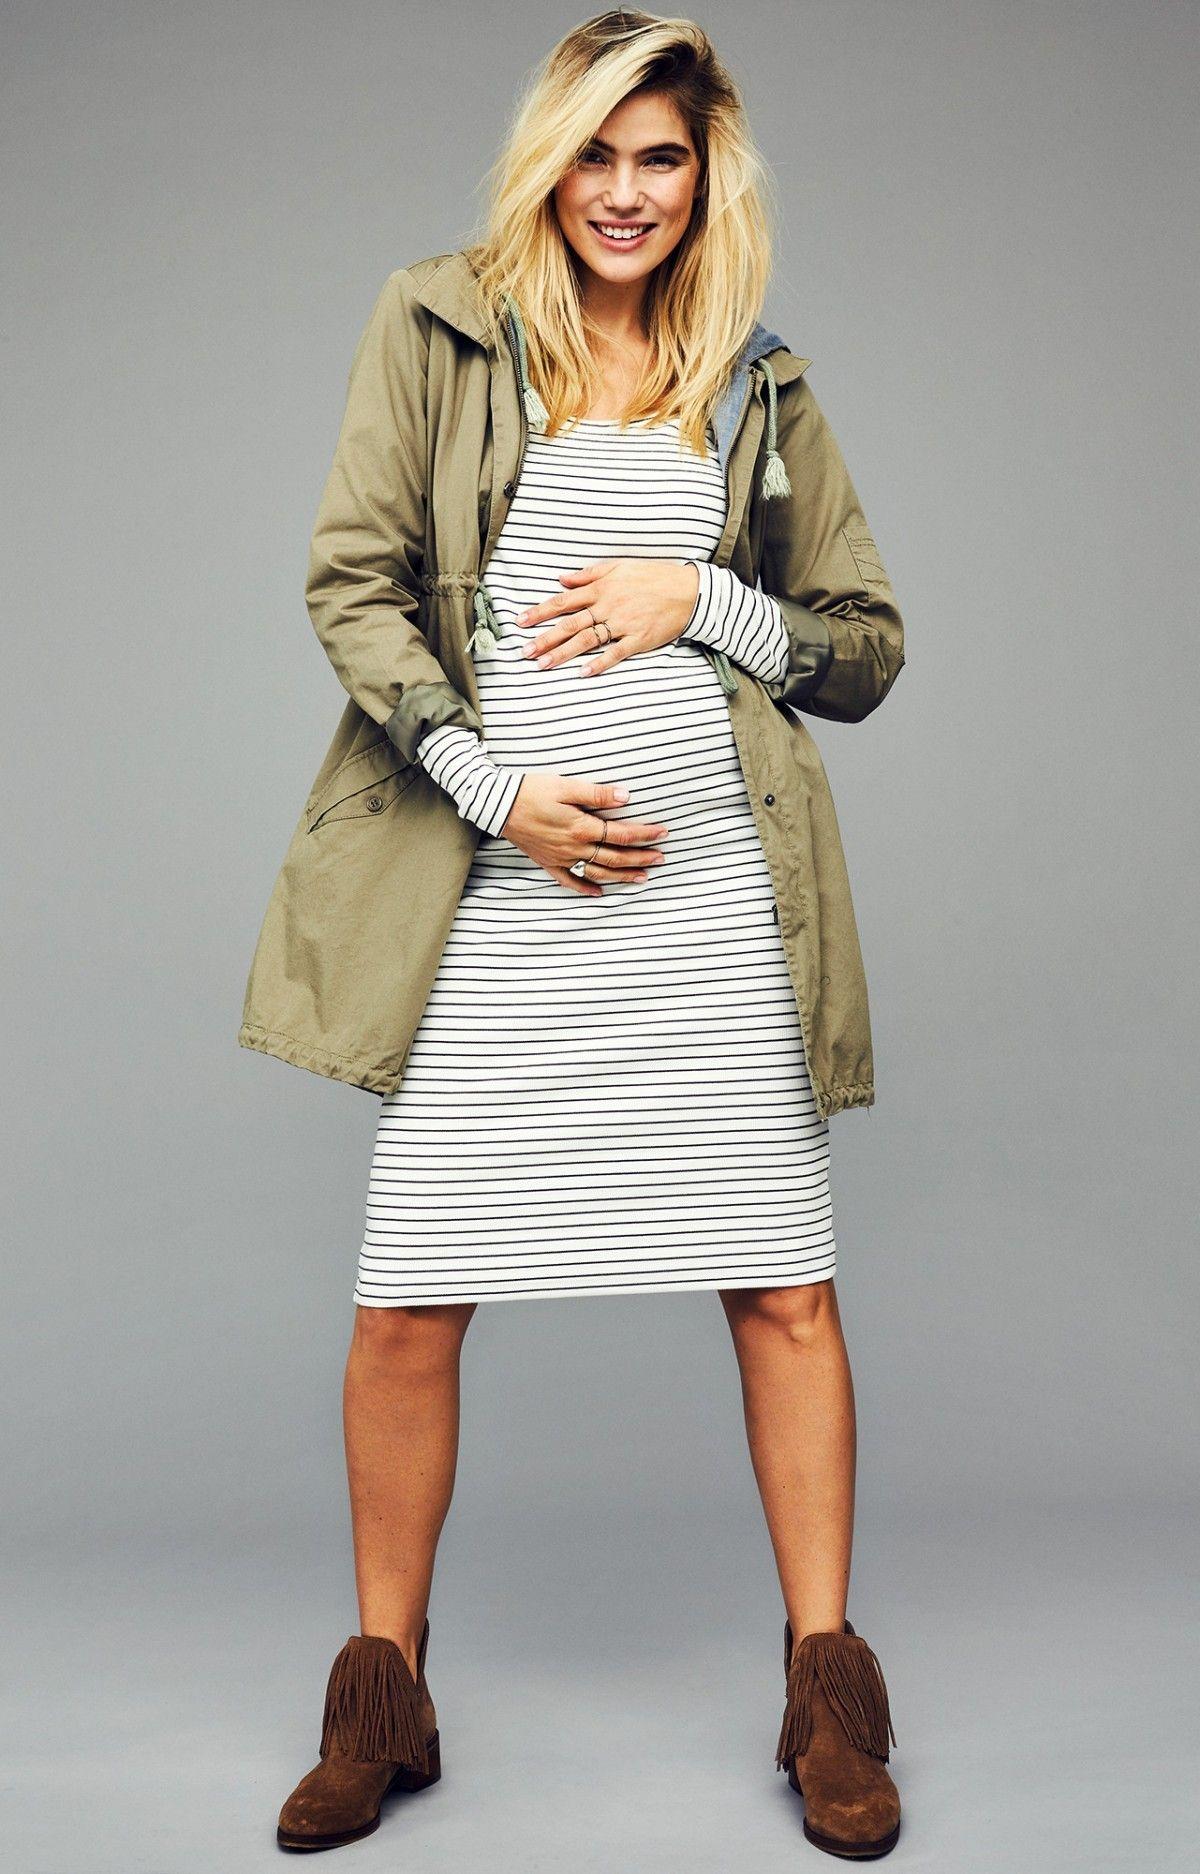 Zwangerschapskleding Zomerjas.Zomerjas Nans Parka Vertiver Zwangerschapskleding Bellyfashion